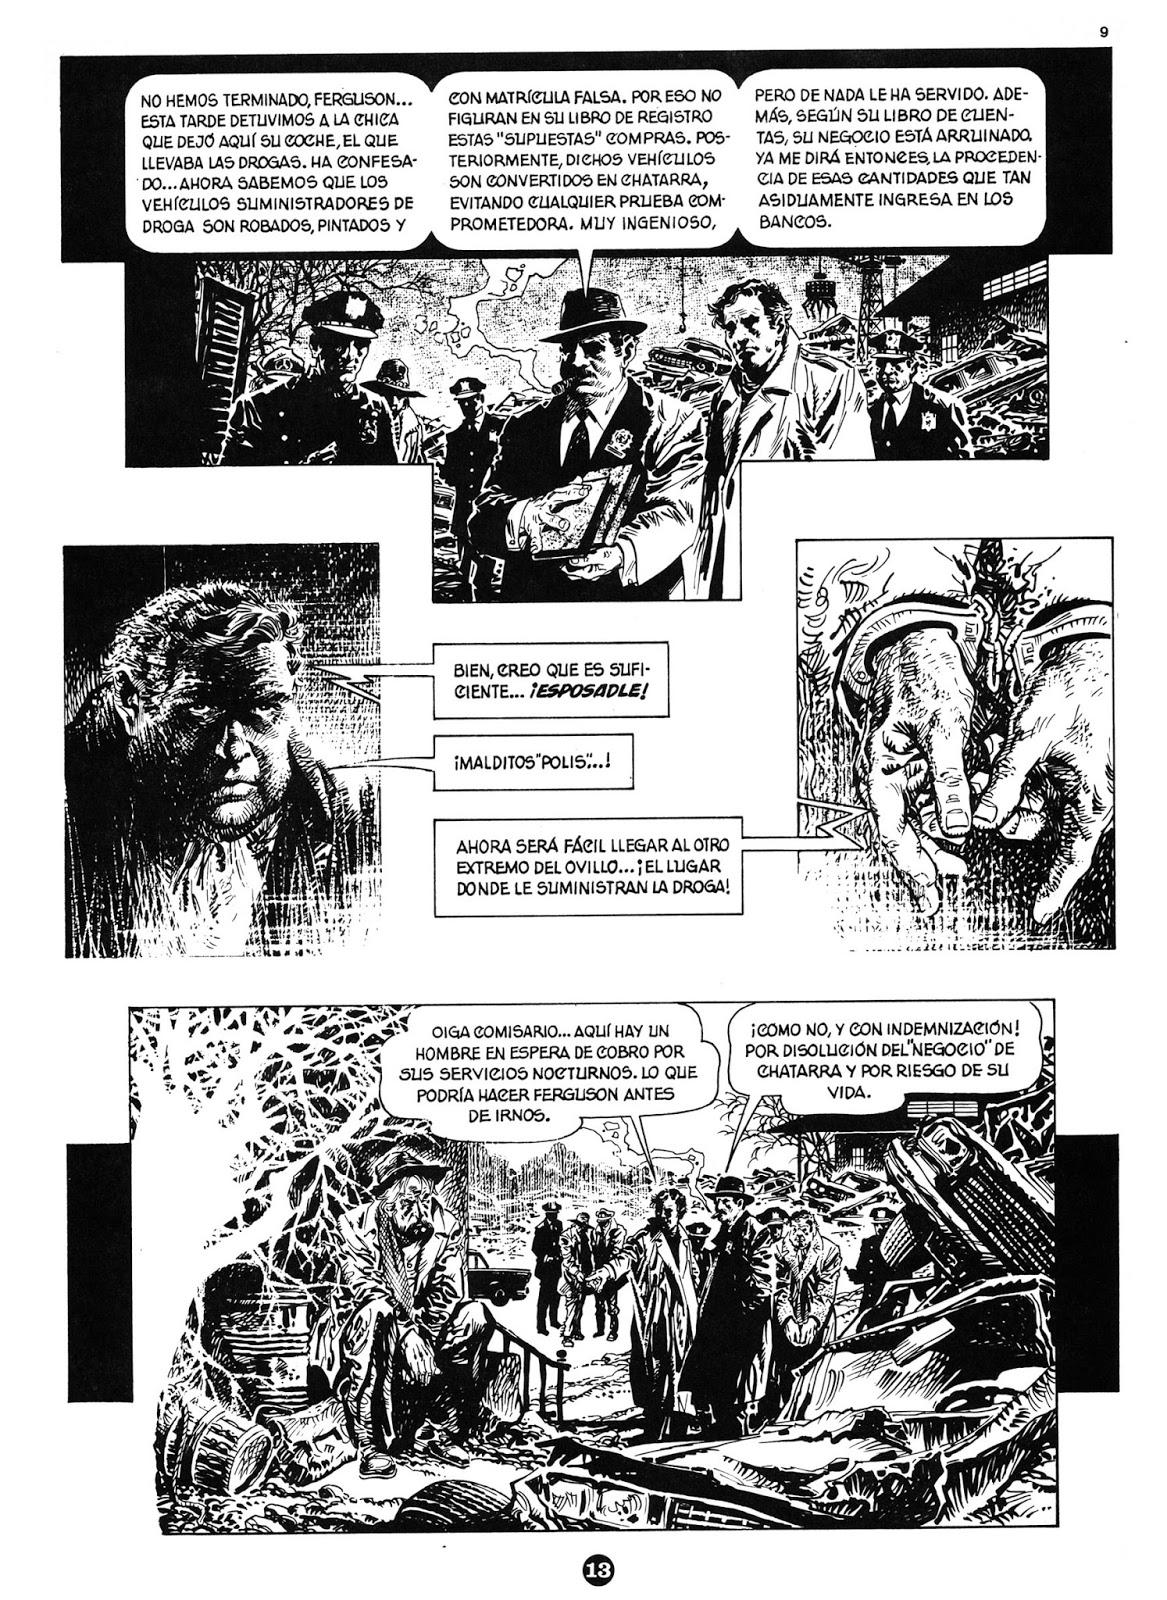 The PorPor Books Blog: SF and Fantasy Books 1968 - 1988: March 2018